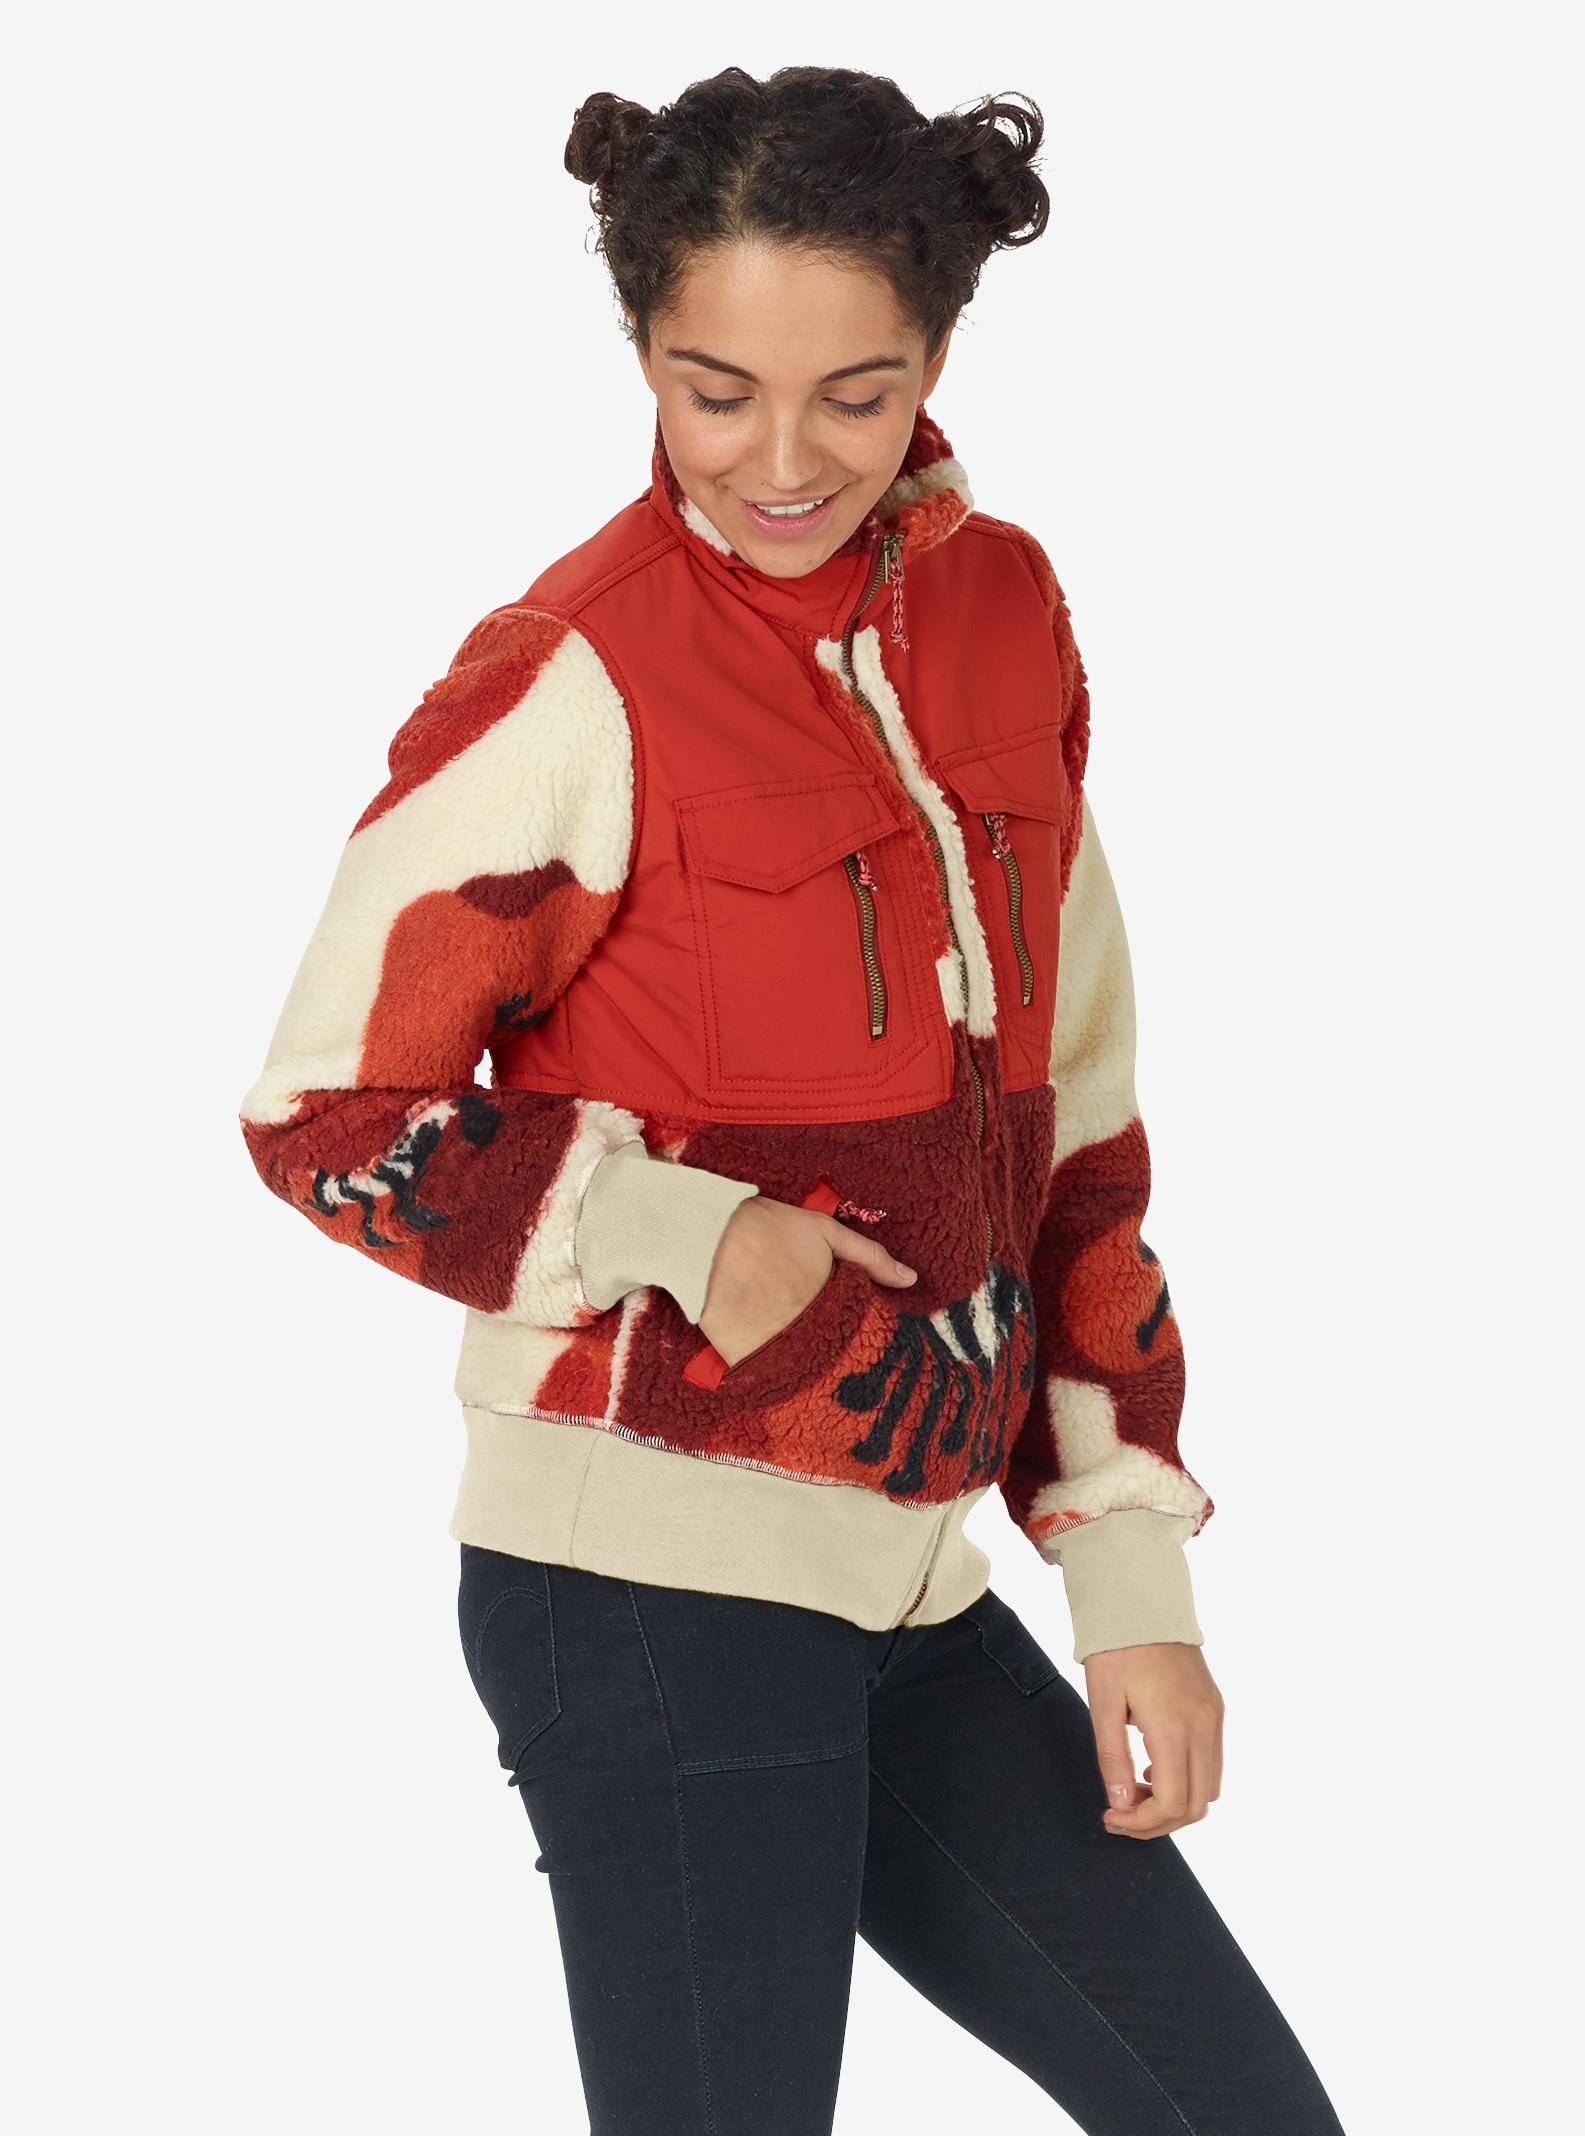 Women's Burton Bolden Full-Zip Fleece shown in Canvas Poppyfield